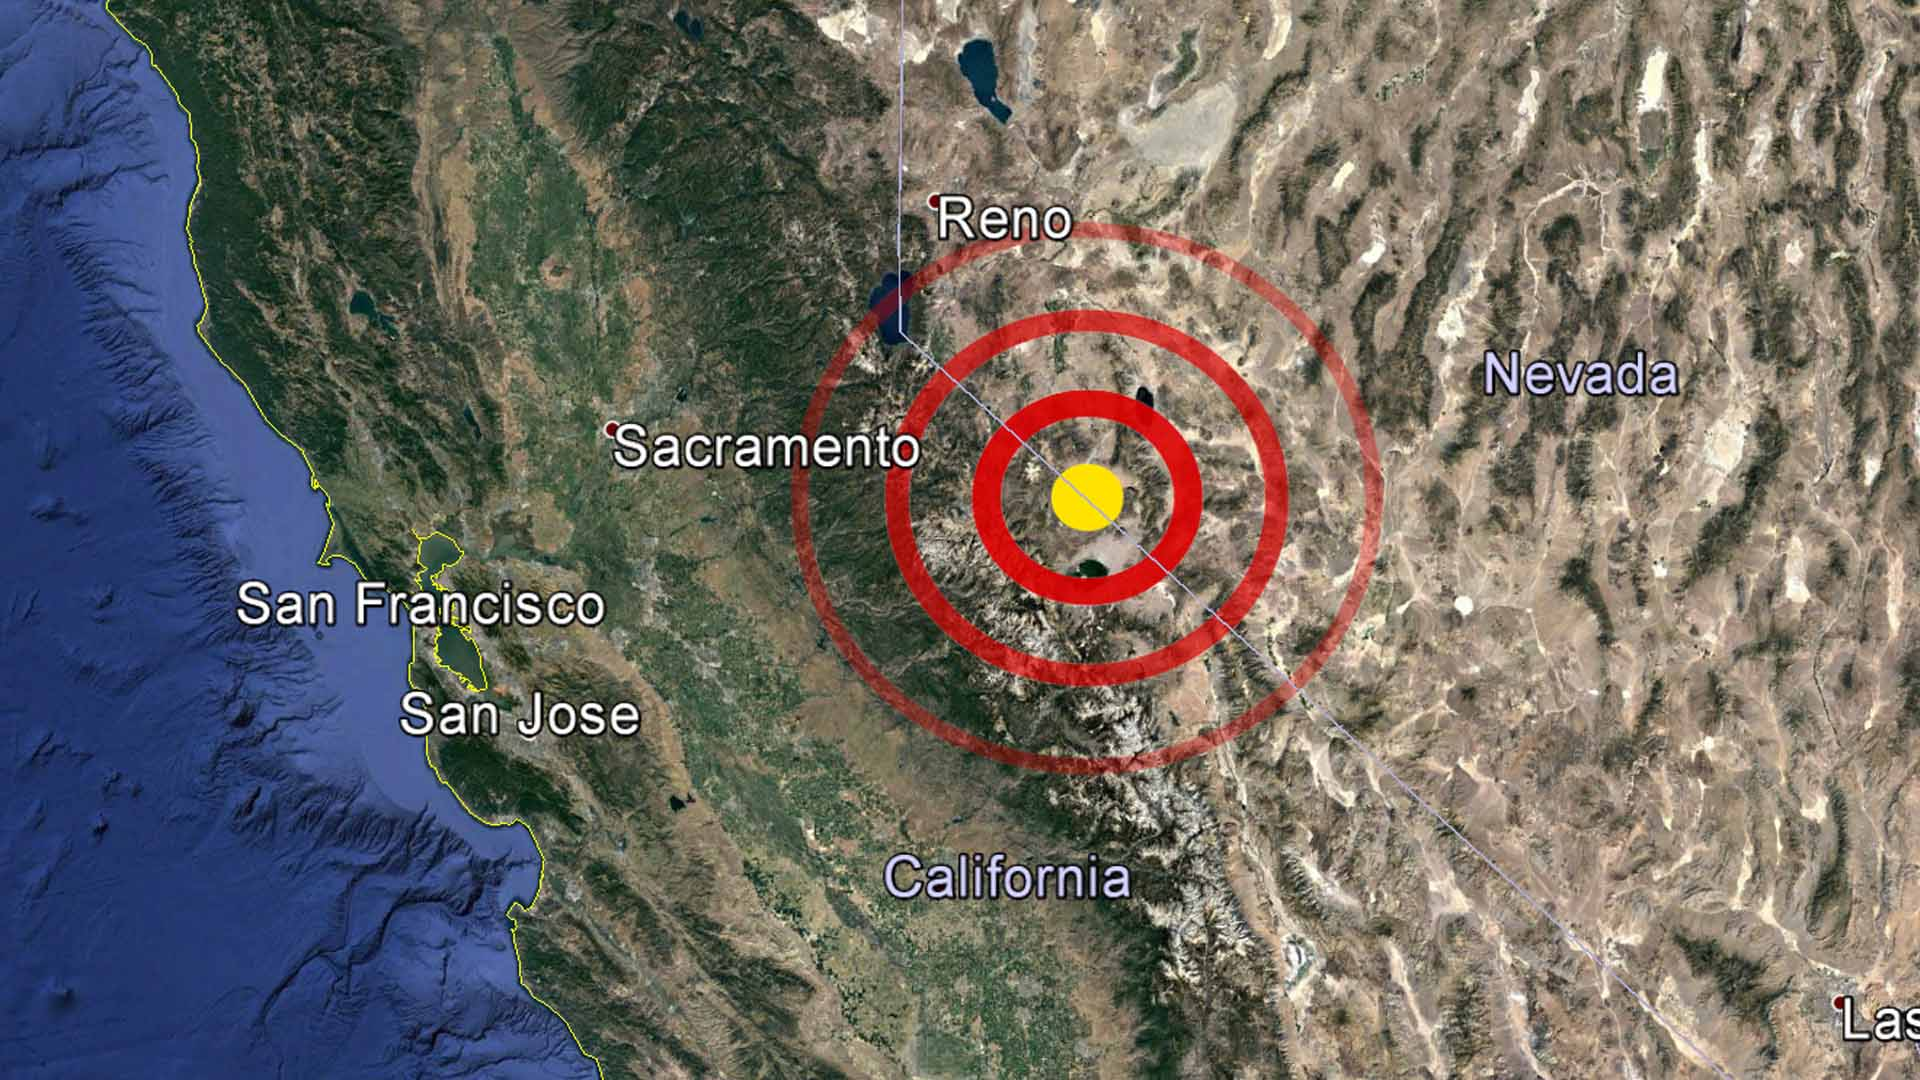 hawthorne nevada a series of earthquakes shook along the california nevada border near hawthorne nevada early wednesday morning according to the u s